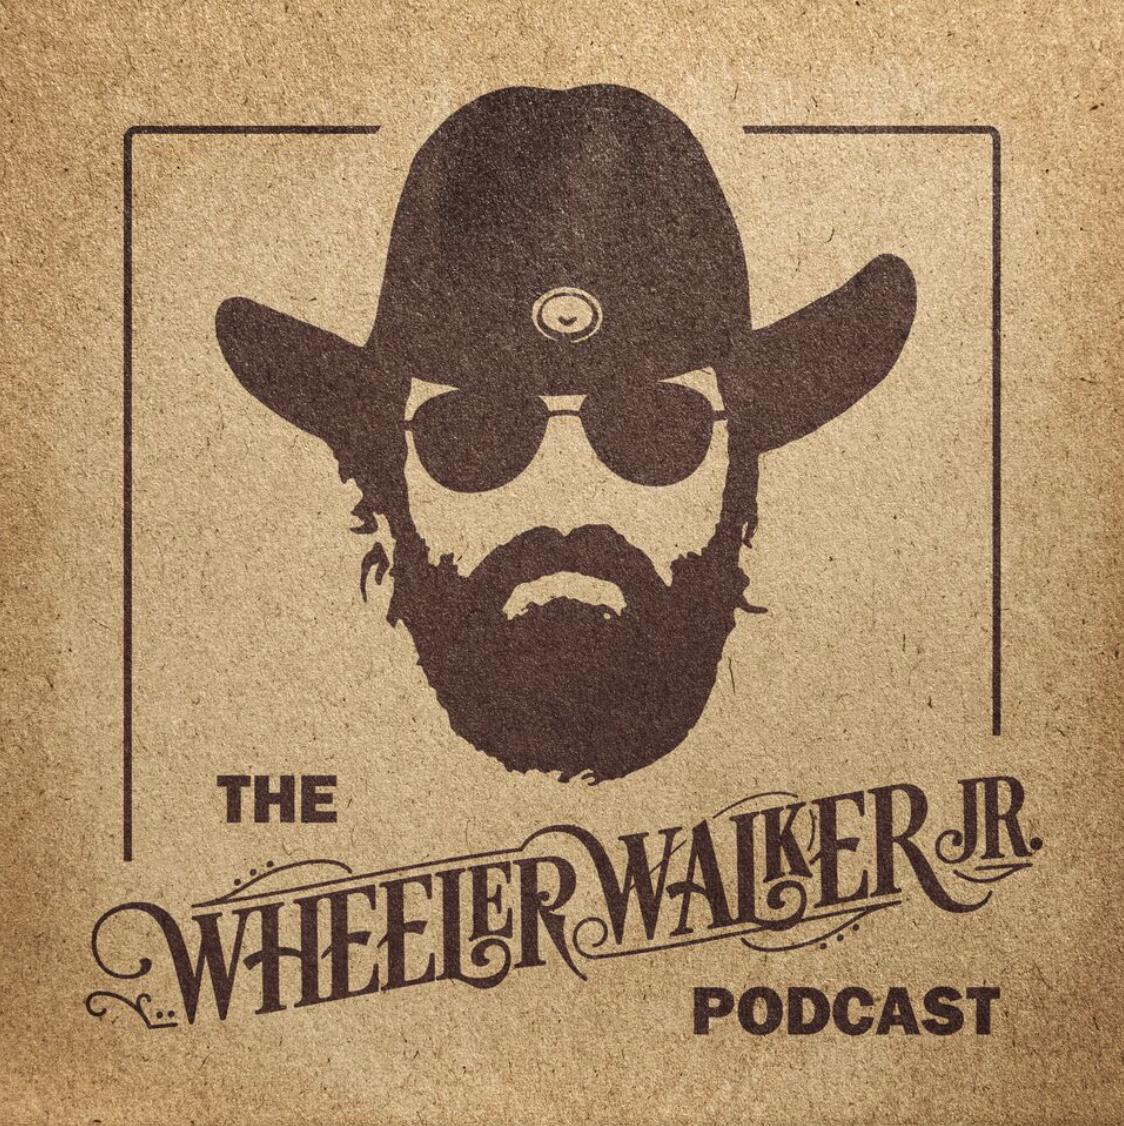 THE WHEELER WALKER JR  PODCAST TRAILER HITS TOP MUSIC PODCAST ON